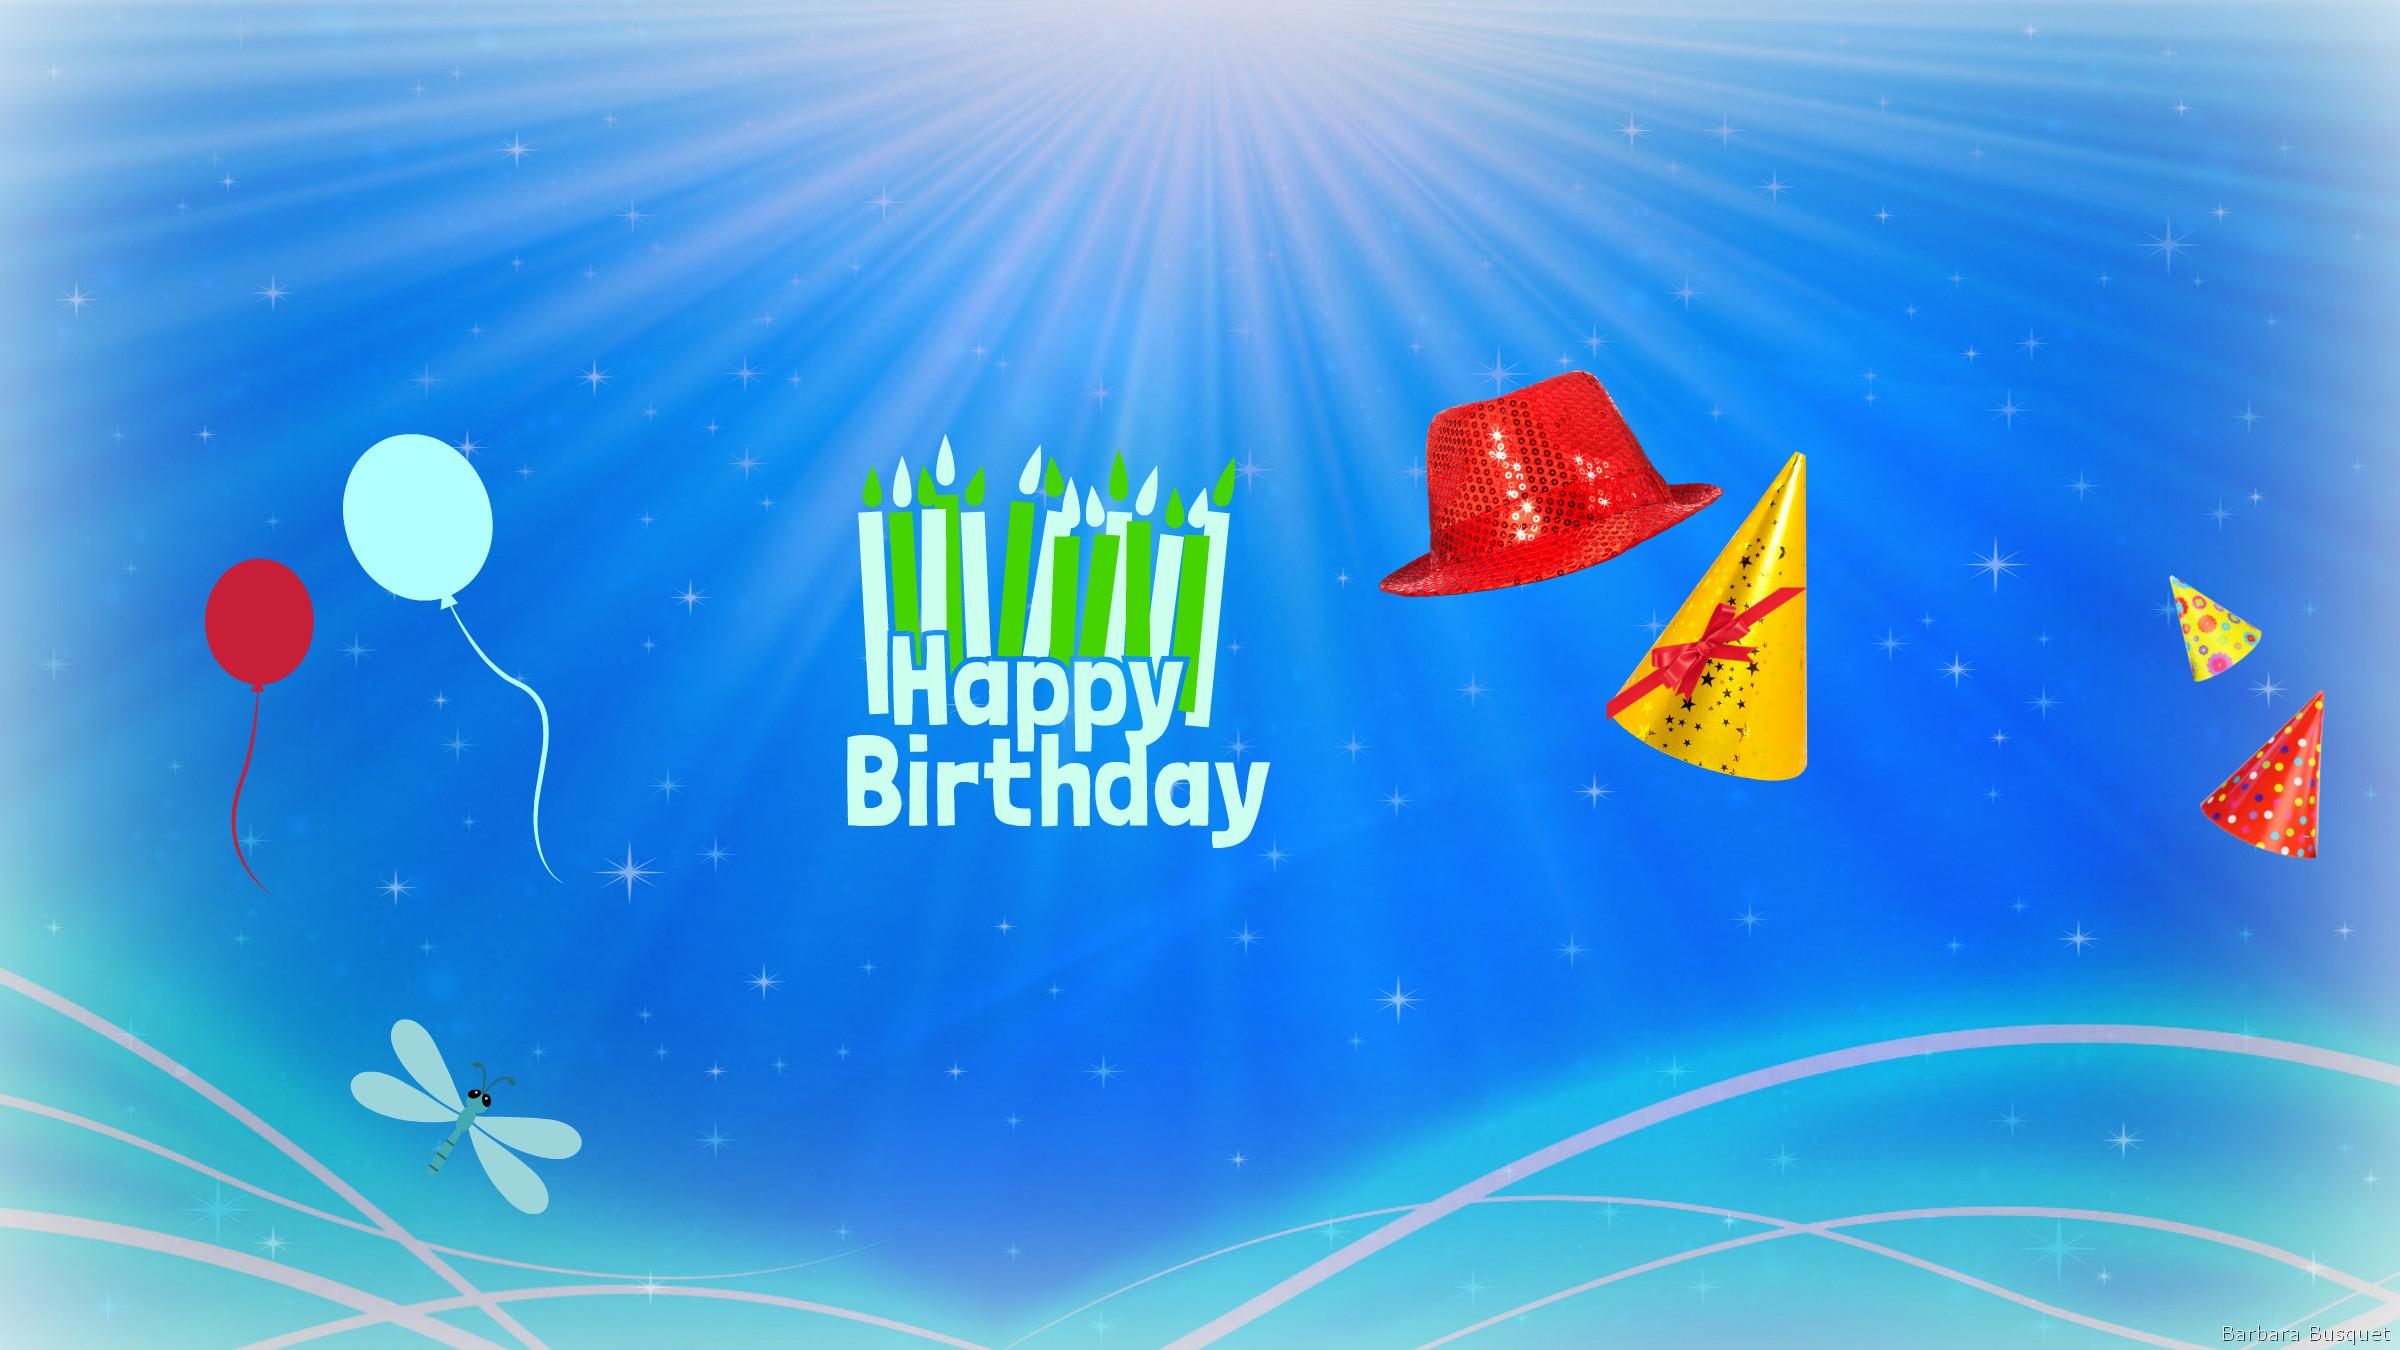 Happy birthday barbaras hd wallpapers - Zedge happy birthday wallpapers ...